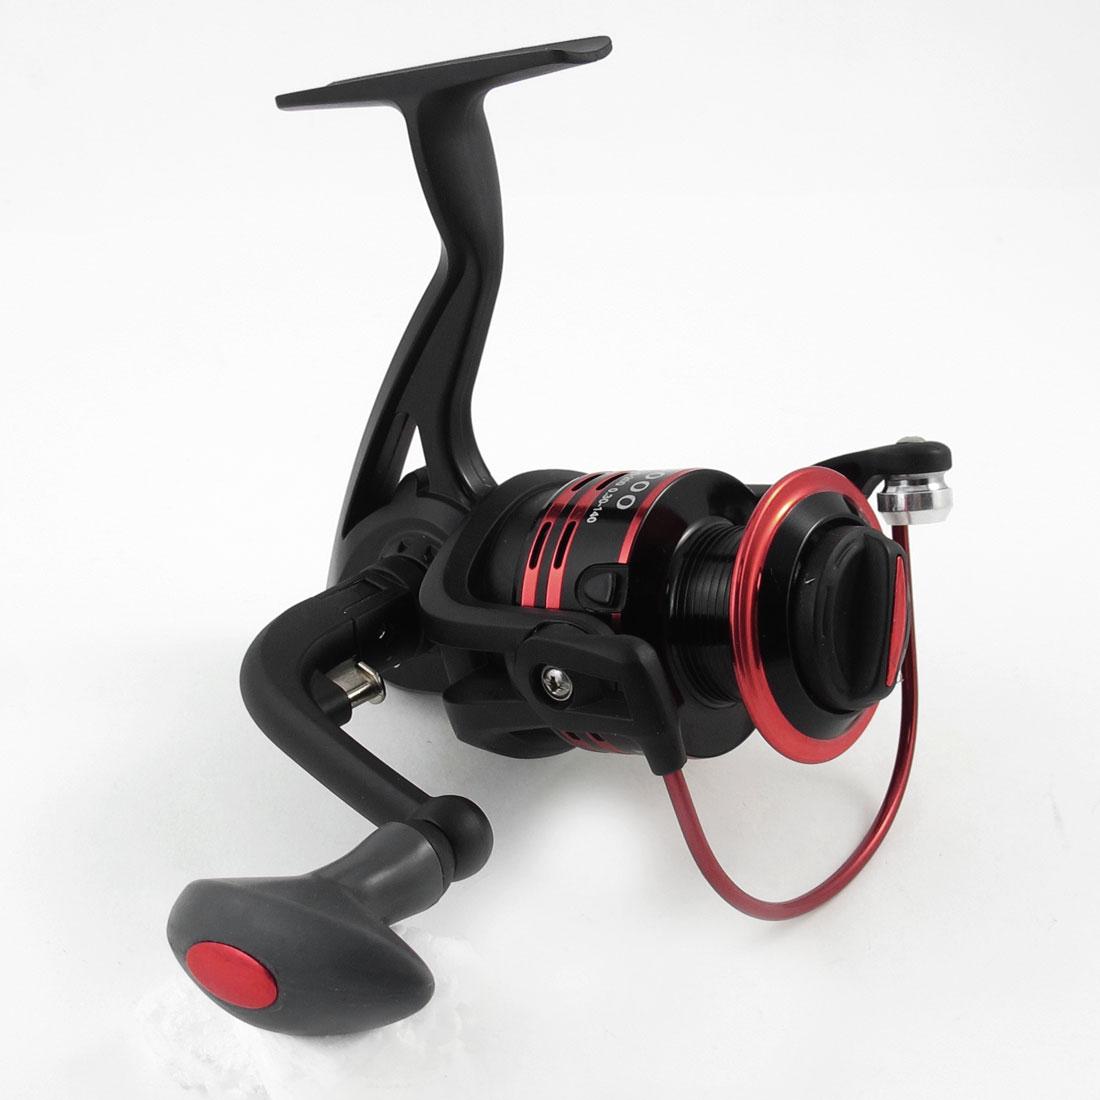 Folding Grip 5.0:1 Gear Ratio 11 Ball Bearing Fishing Spinning Reel Red Black